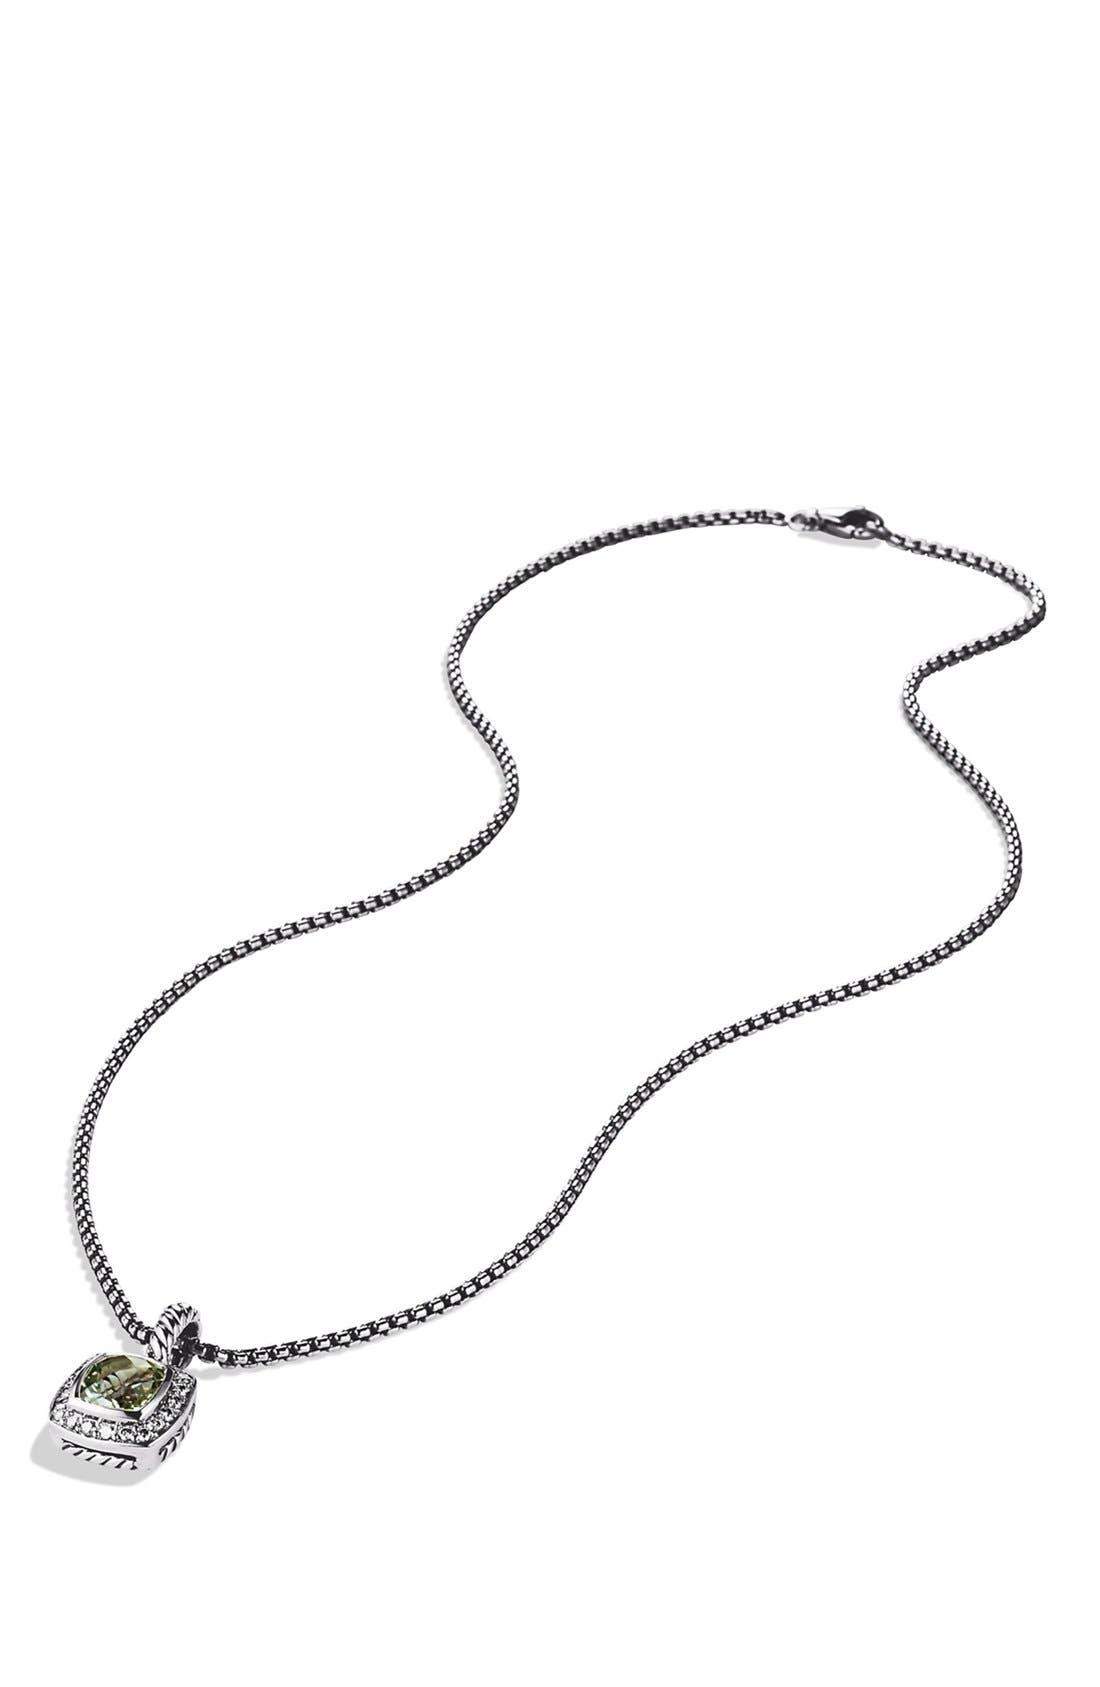 'Albion' Petite Pendant with Prasiolite and Diamonds on Chain,                             Alternate thumbnail 2, color,                             PRASIOLITE